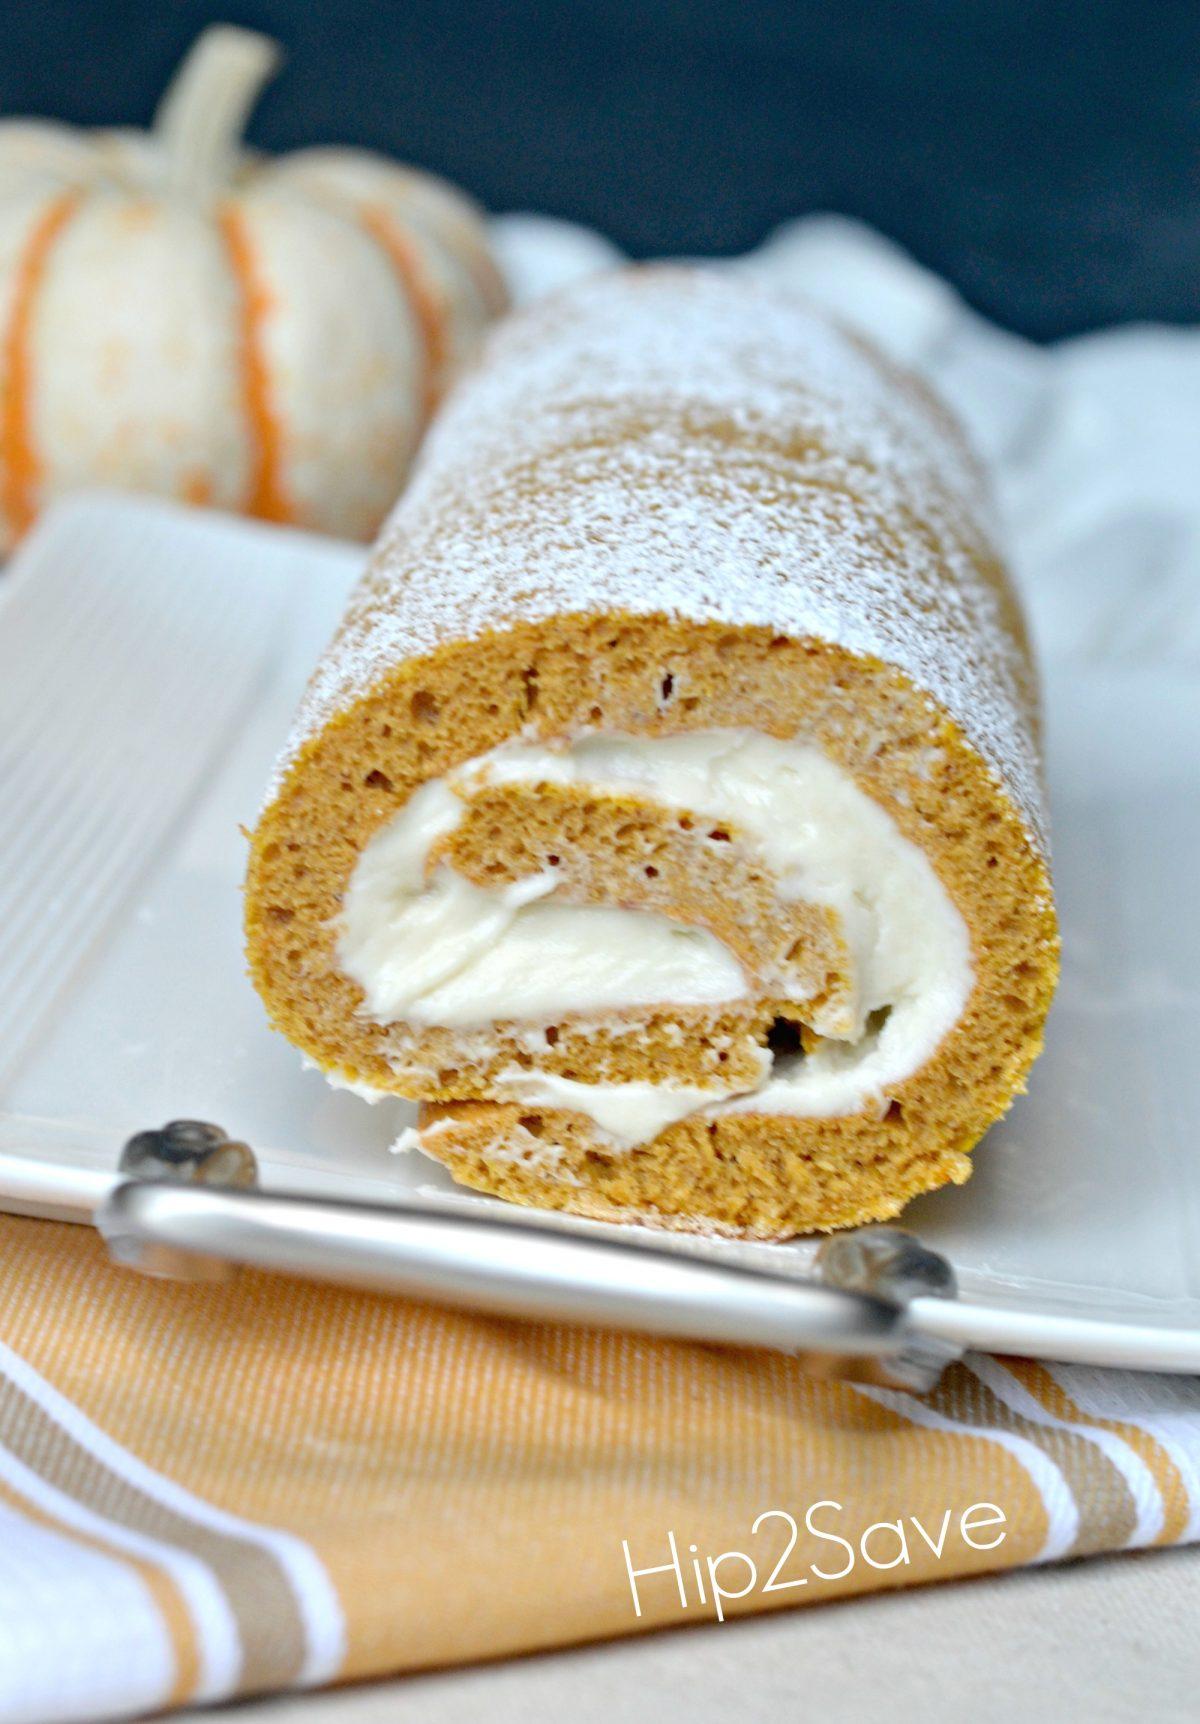 Easy pumpkin roll recipe Hip2Save